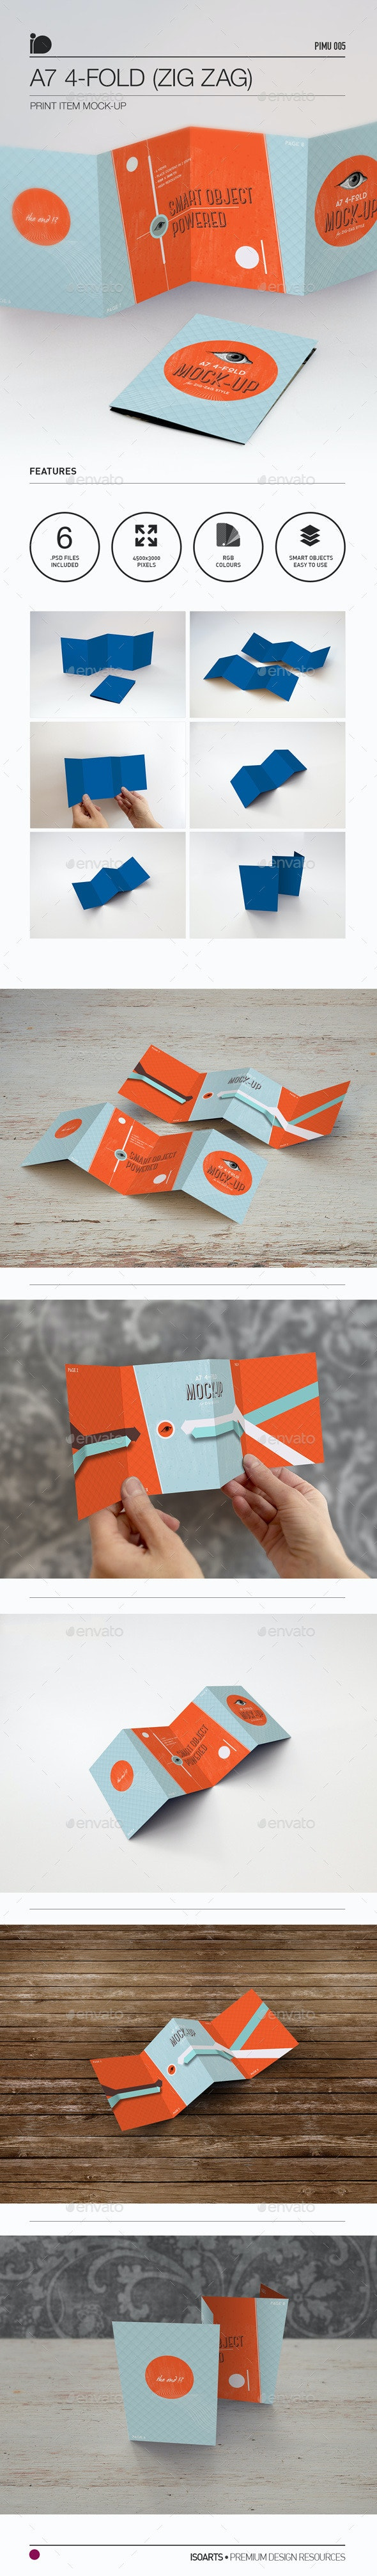 Mock-Up • A7 4-Fold (Zig Zag) Brochure - Brochures Print